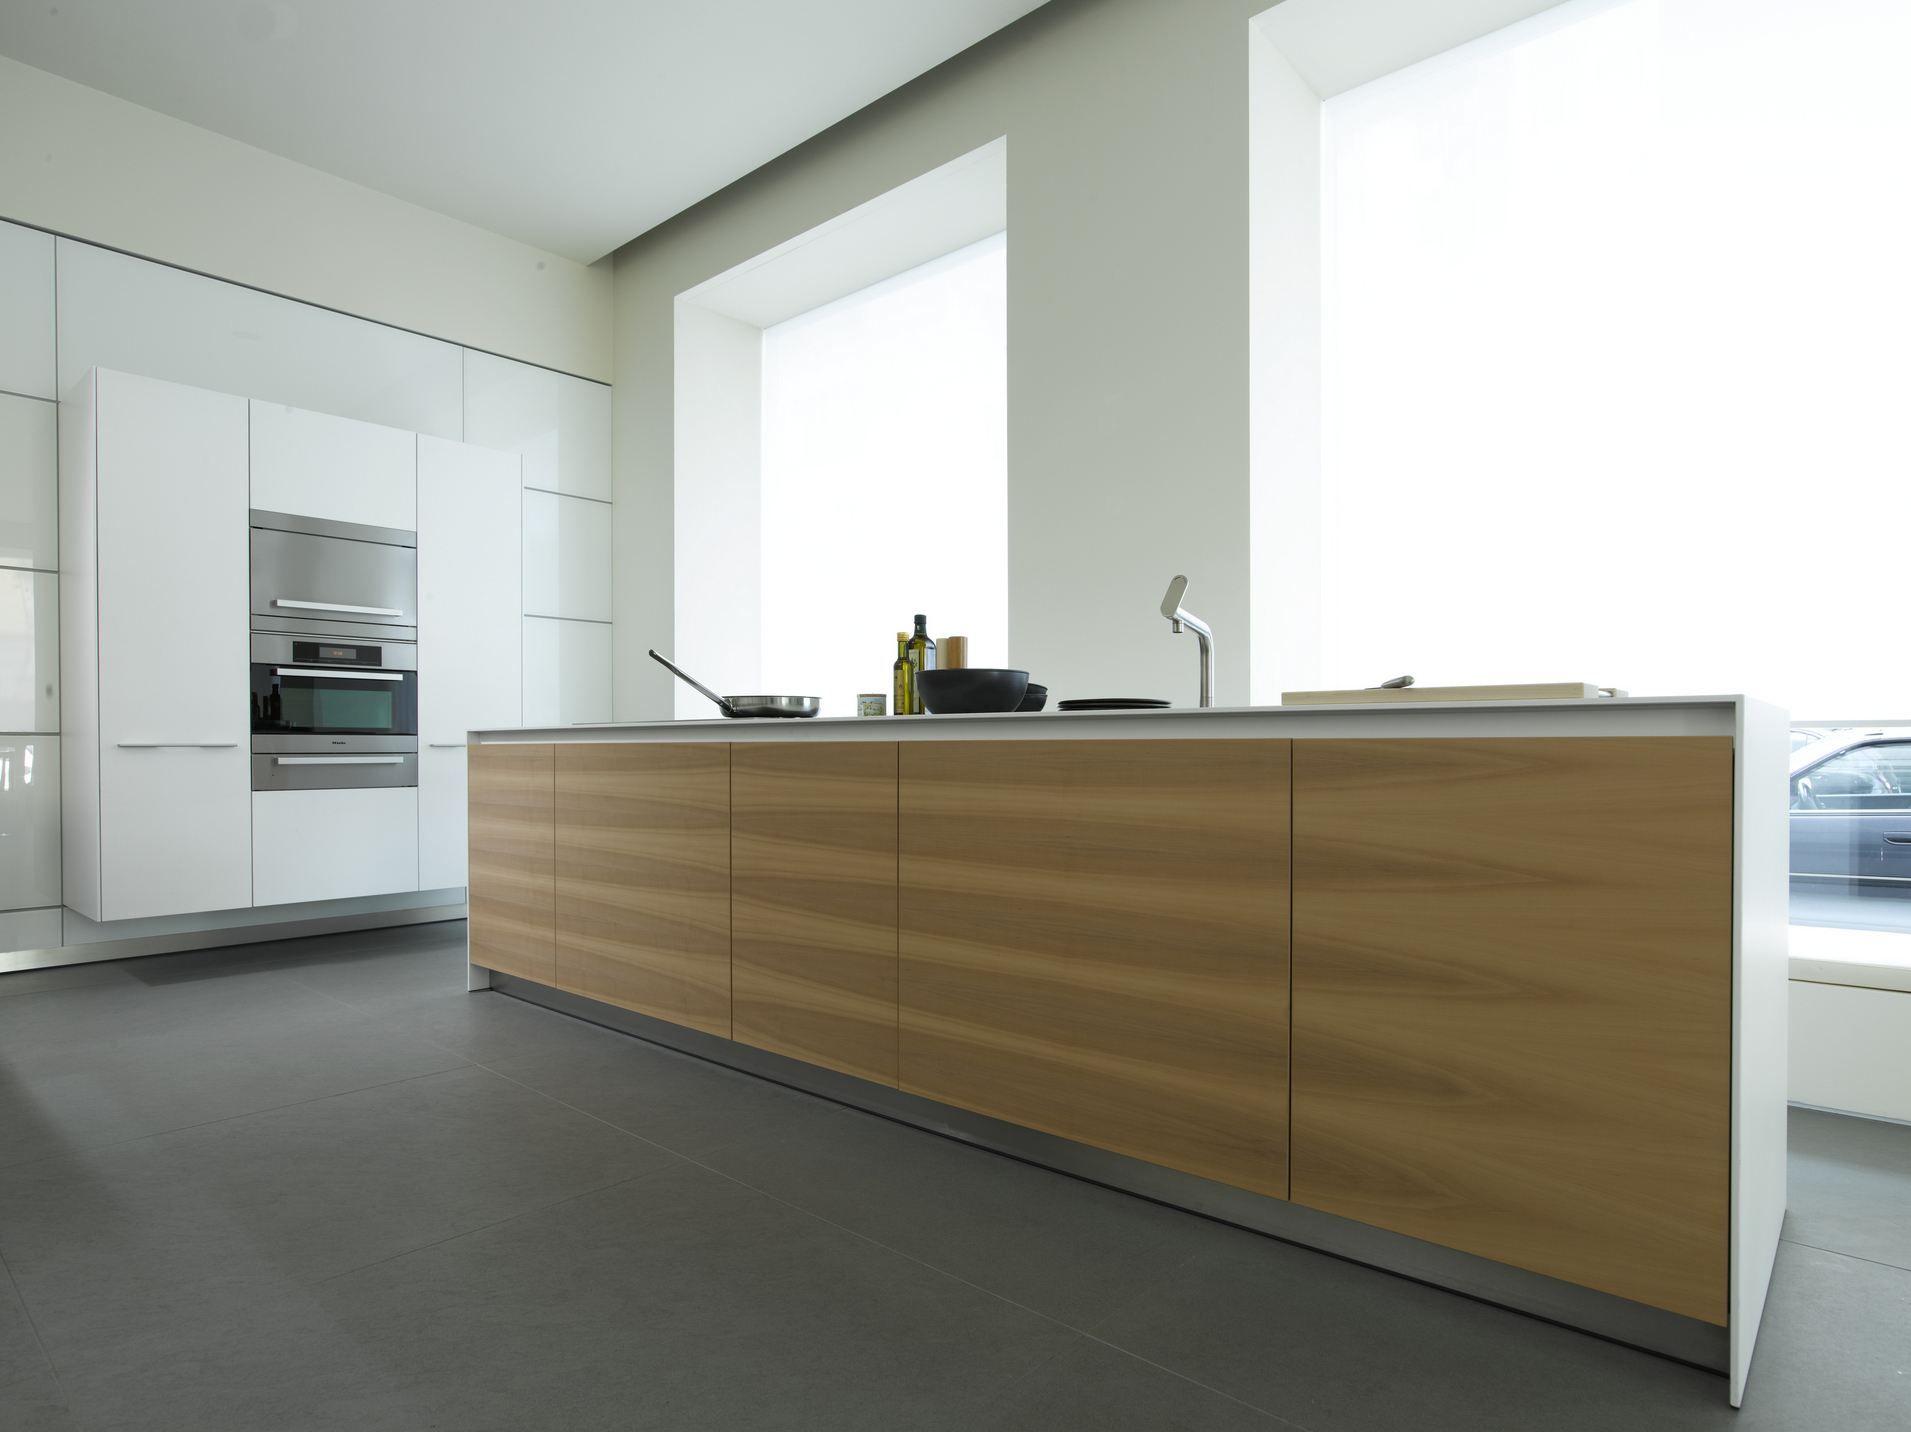 B3 Wood veneer kitchen by Bulthaup | EyeCandy | Pinterest | Wood ...